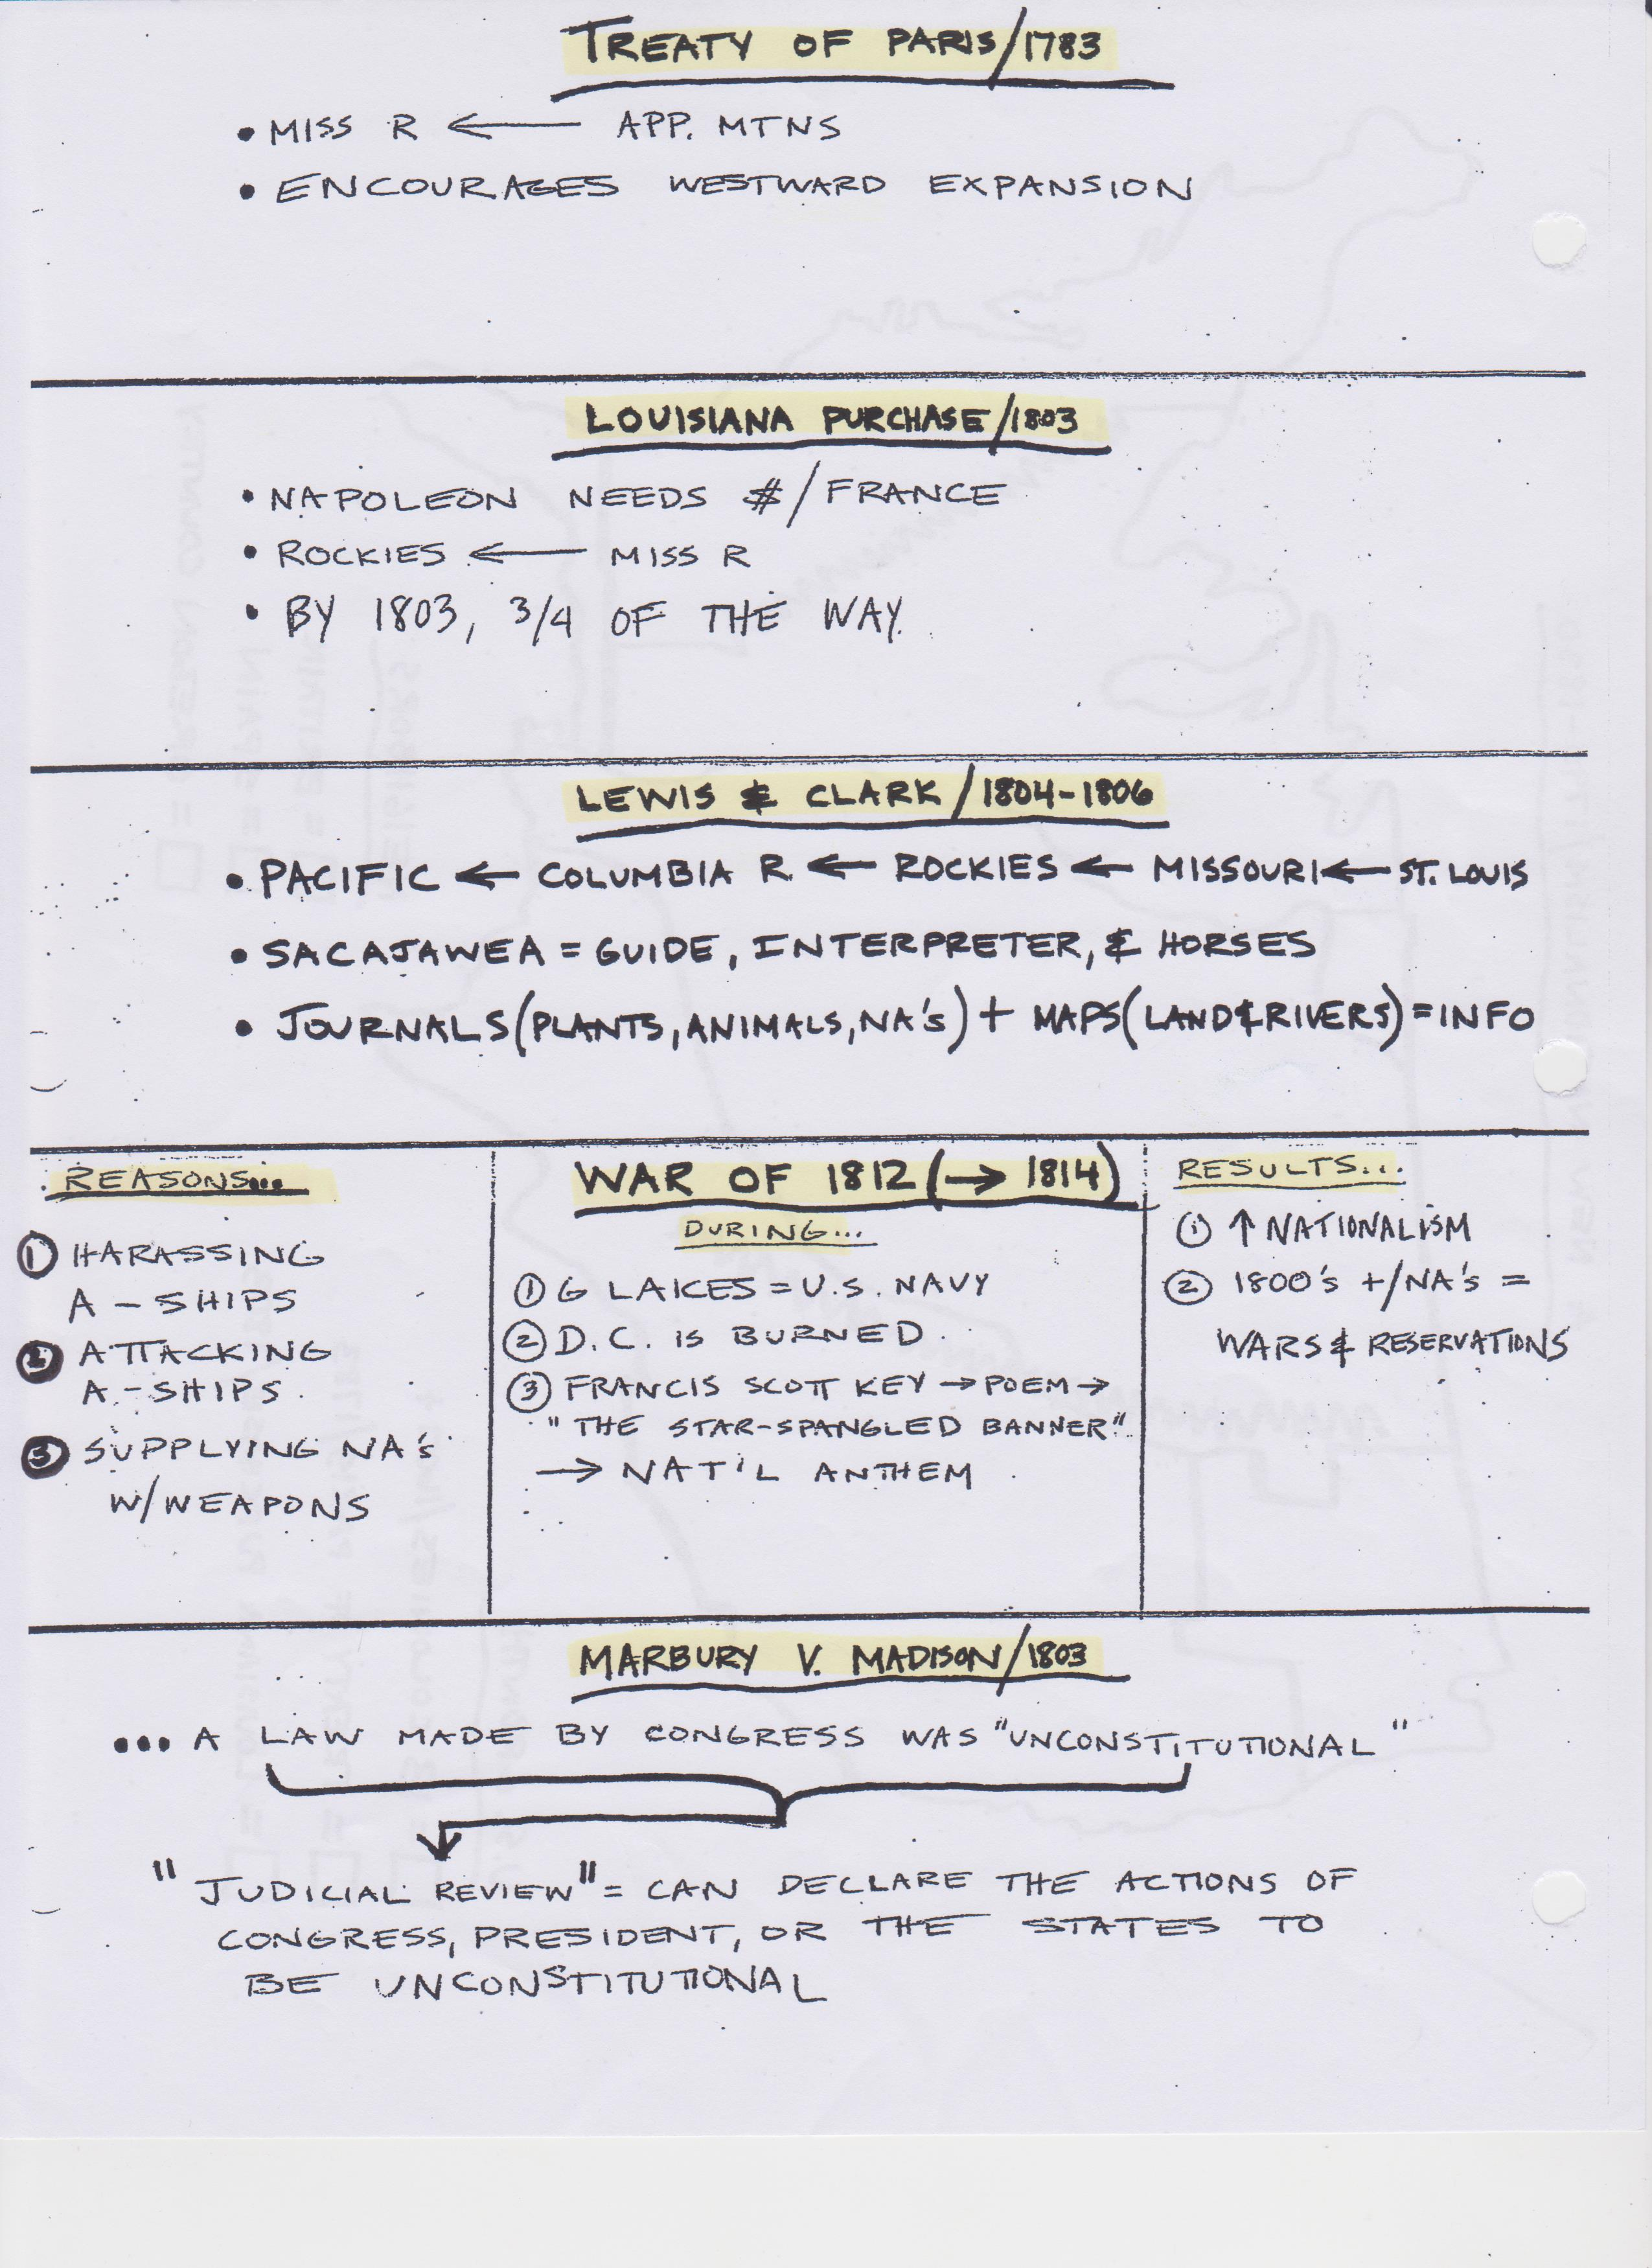 002 Manifest Destiny Essay Ch20920notes20pg202202016 Impressive Prompt Outline Introduction Full